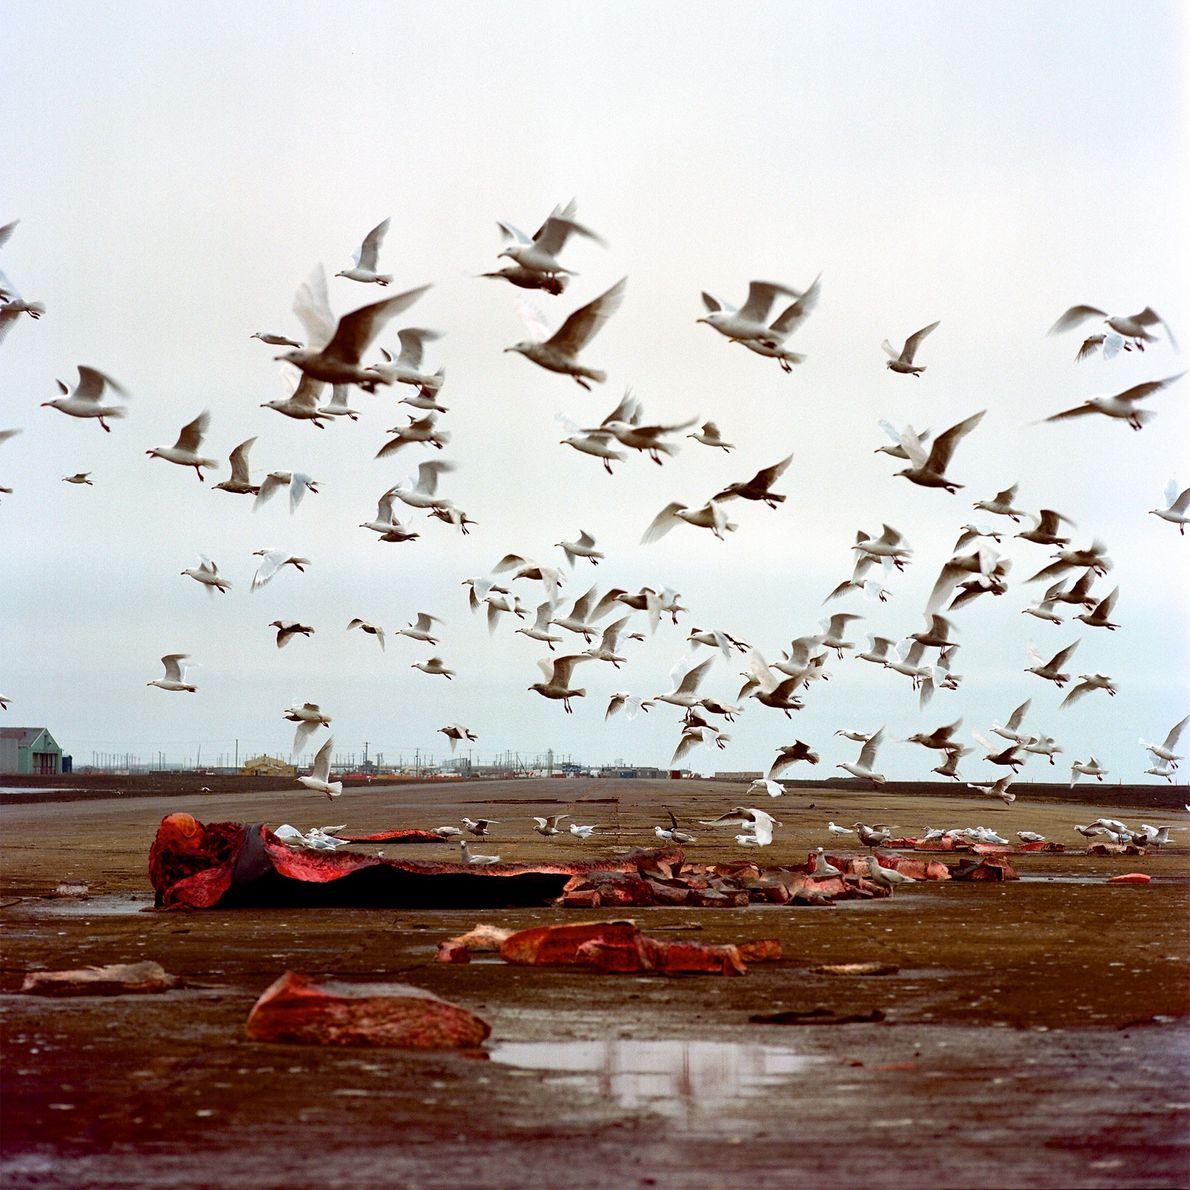 Seagulls in Utqiagvik, Alaska, enjoy what's left of a bowhead whale.